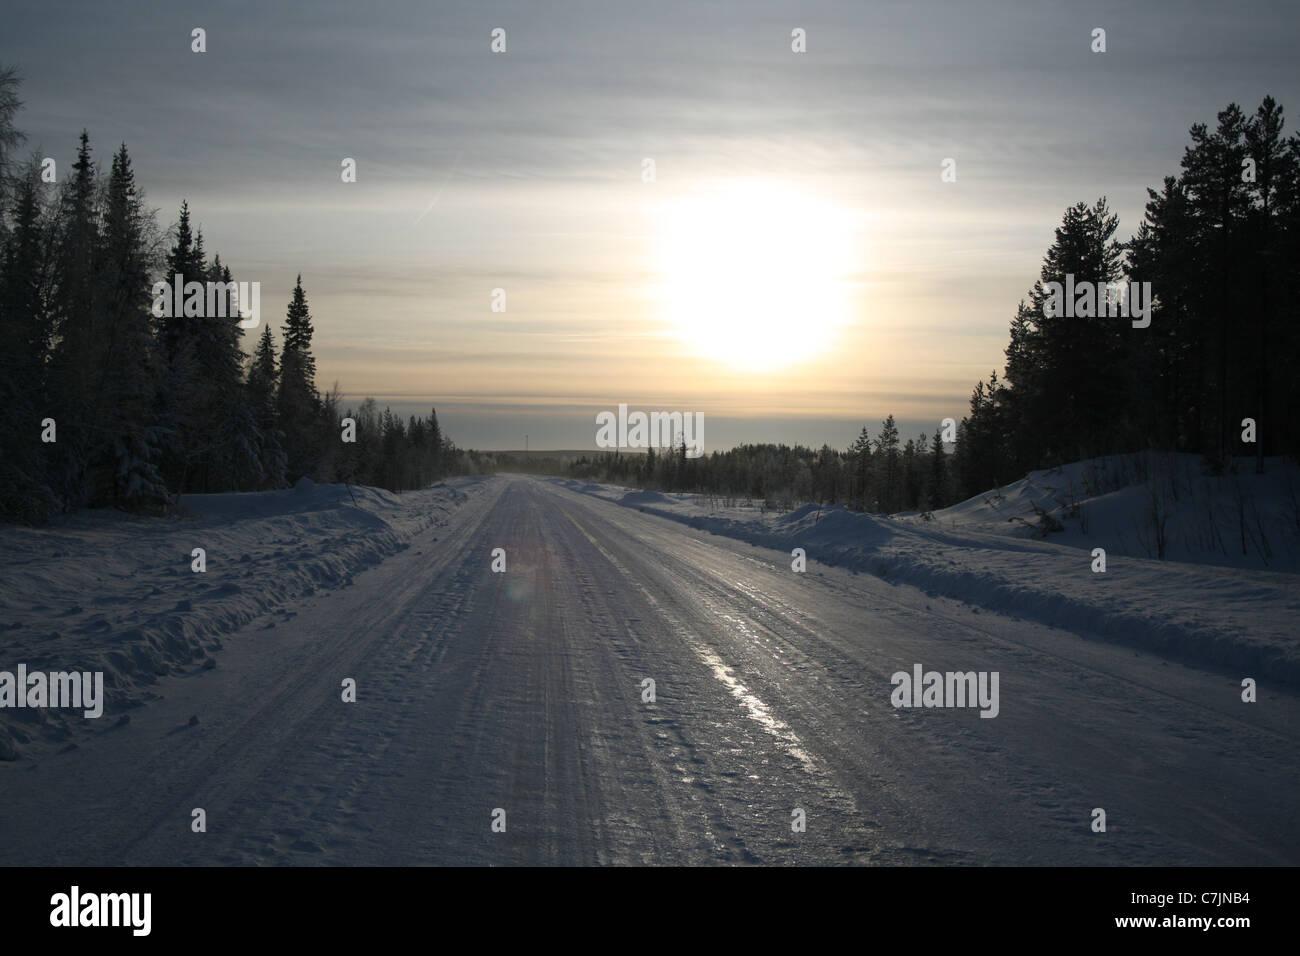 Frozen road in Northern Sweden - Stock Image